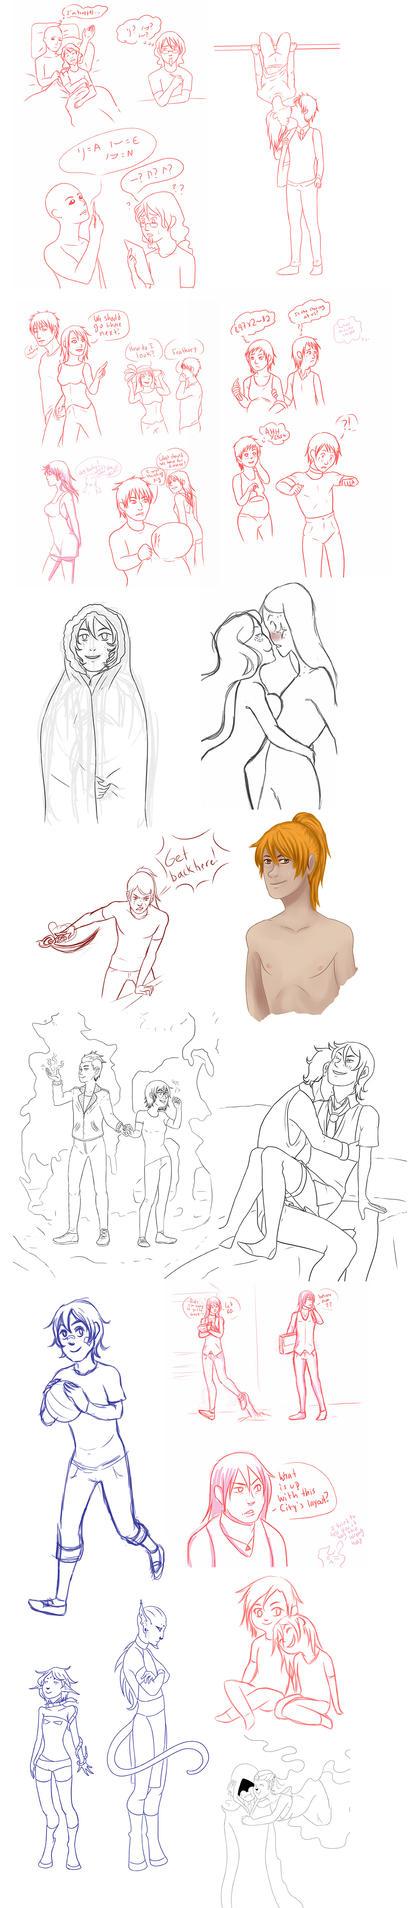 Tumblr doodledump by SaraV-Art